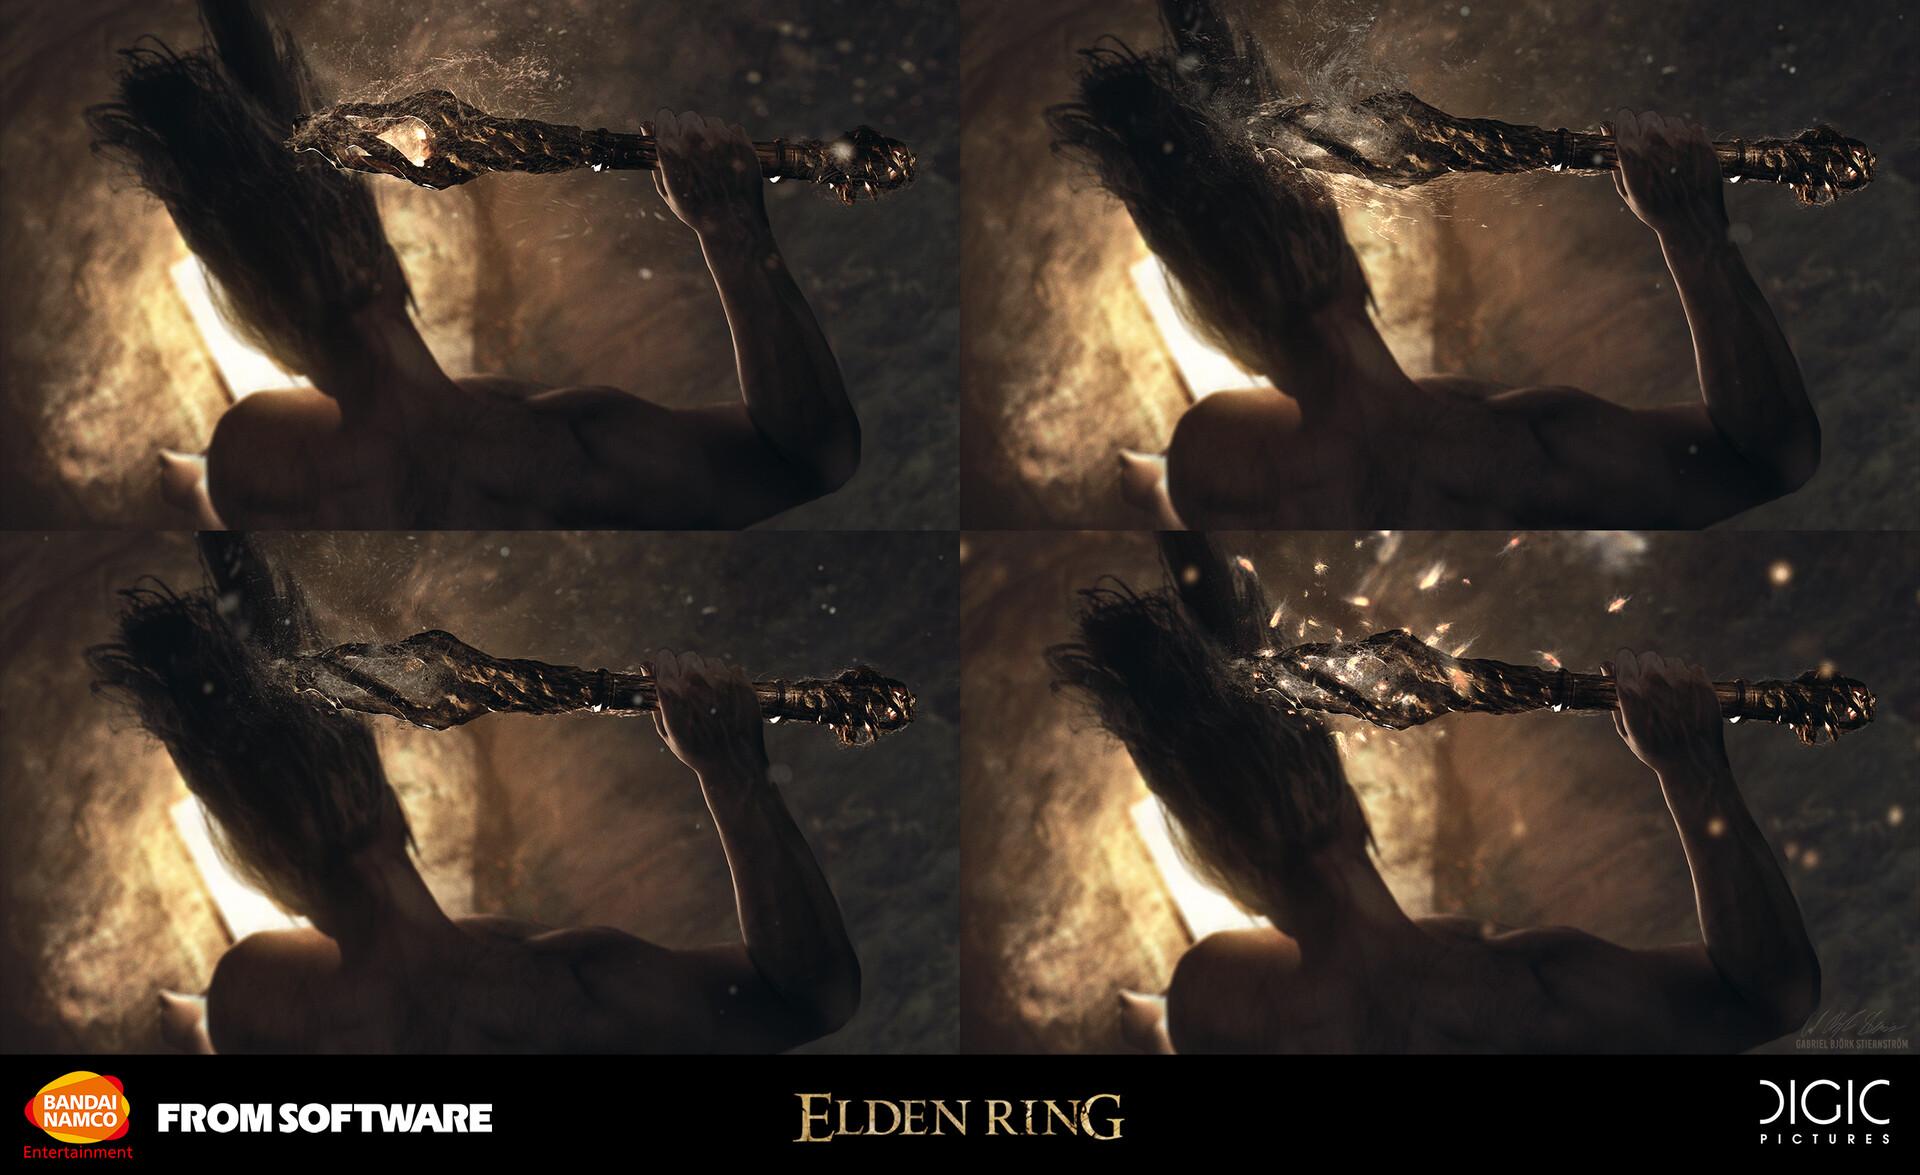 eldenring-digic-concept-scepterfx-high